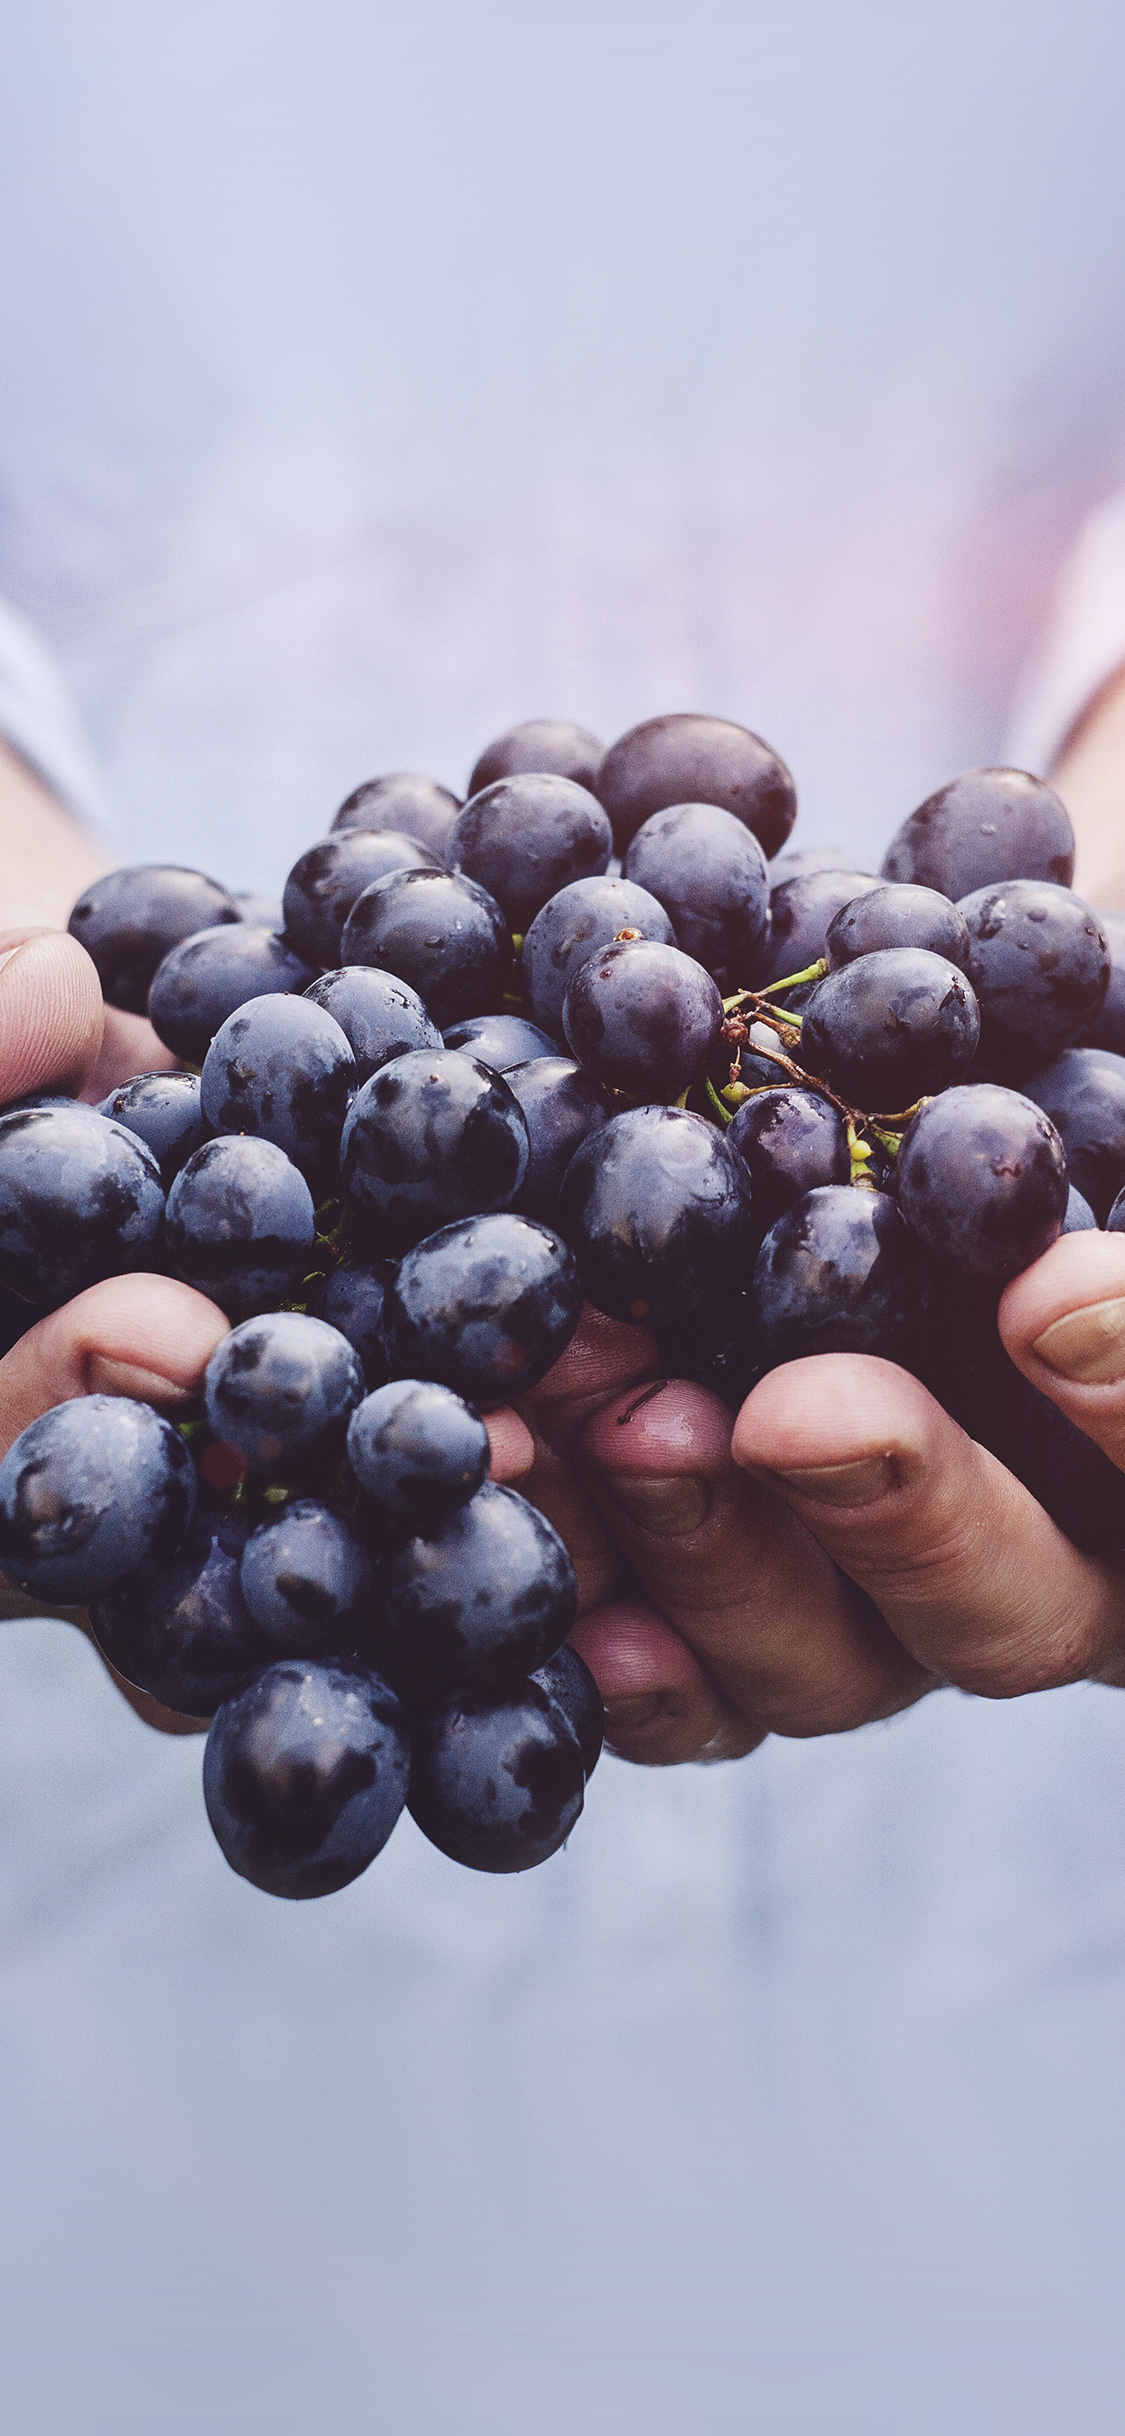 iPhonexpapers.com-Apple-iPhone-wallpaper-ms42-farmer-food-grapes-fruit-nature-bokeh-flare